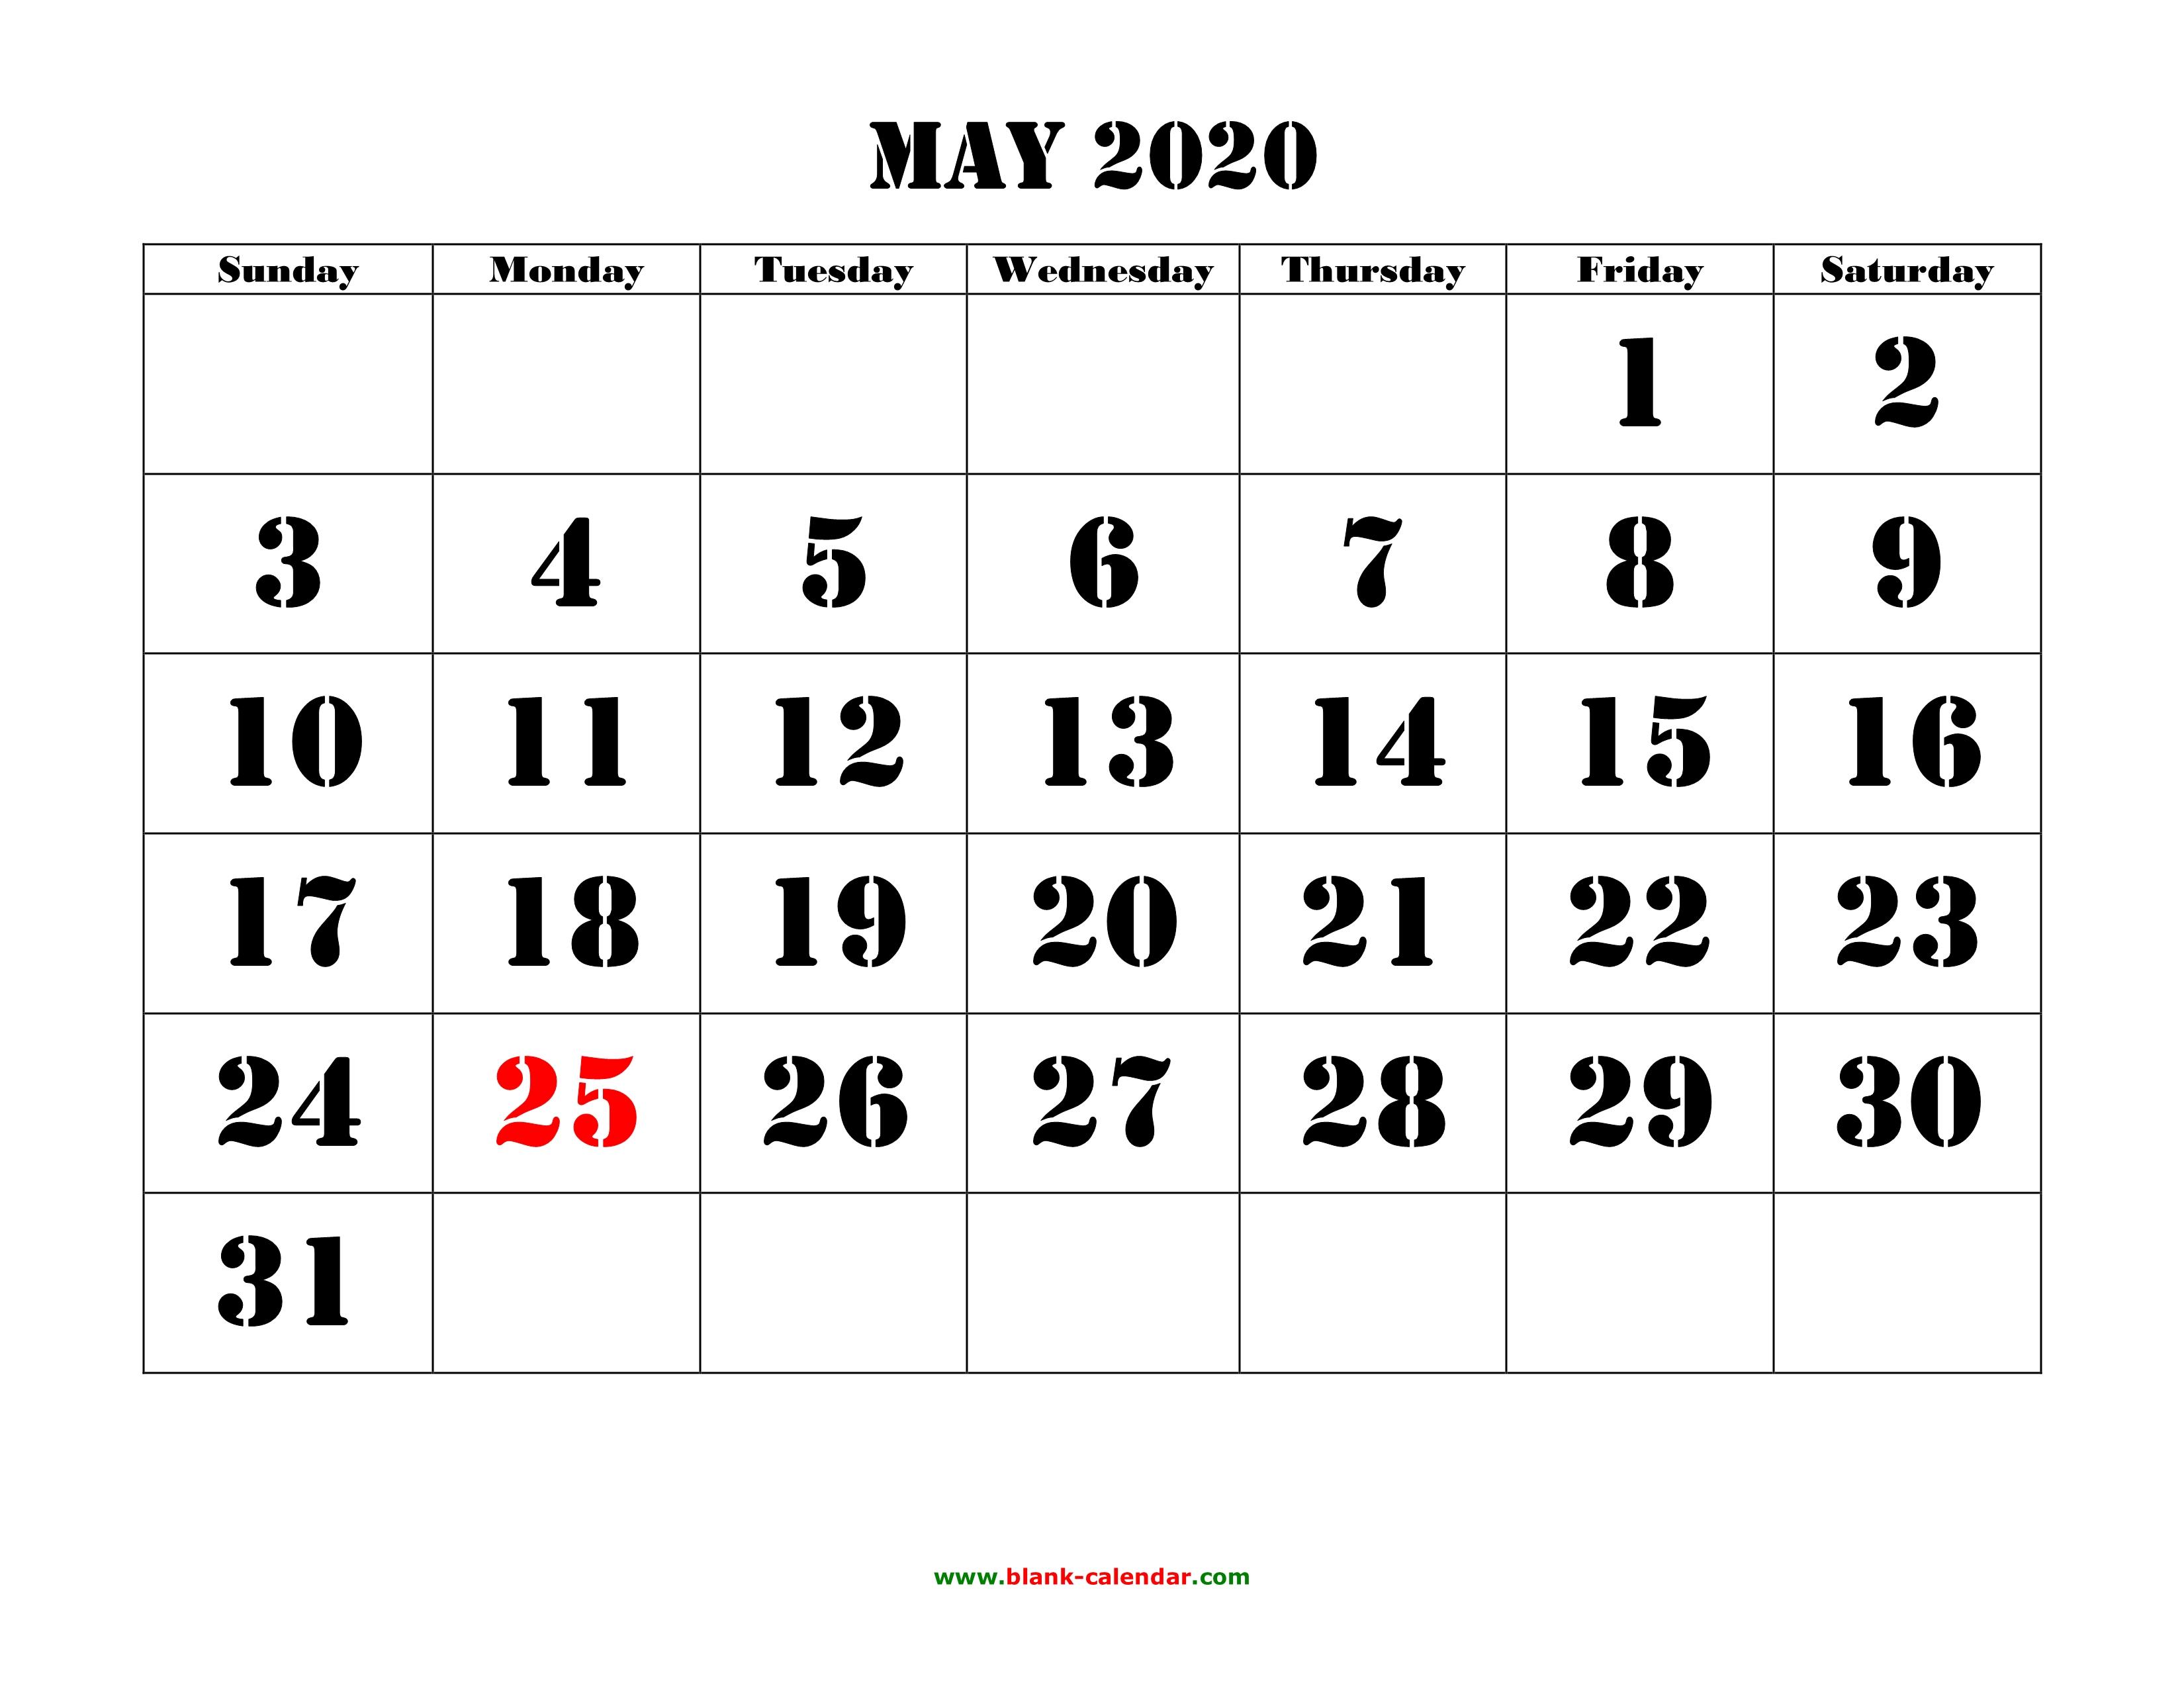 Free Download Printable May 2020 Calendar, Large Font Design in Large Print 2020 Calendar To Print Free